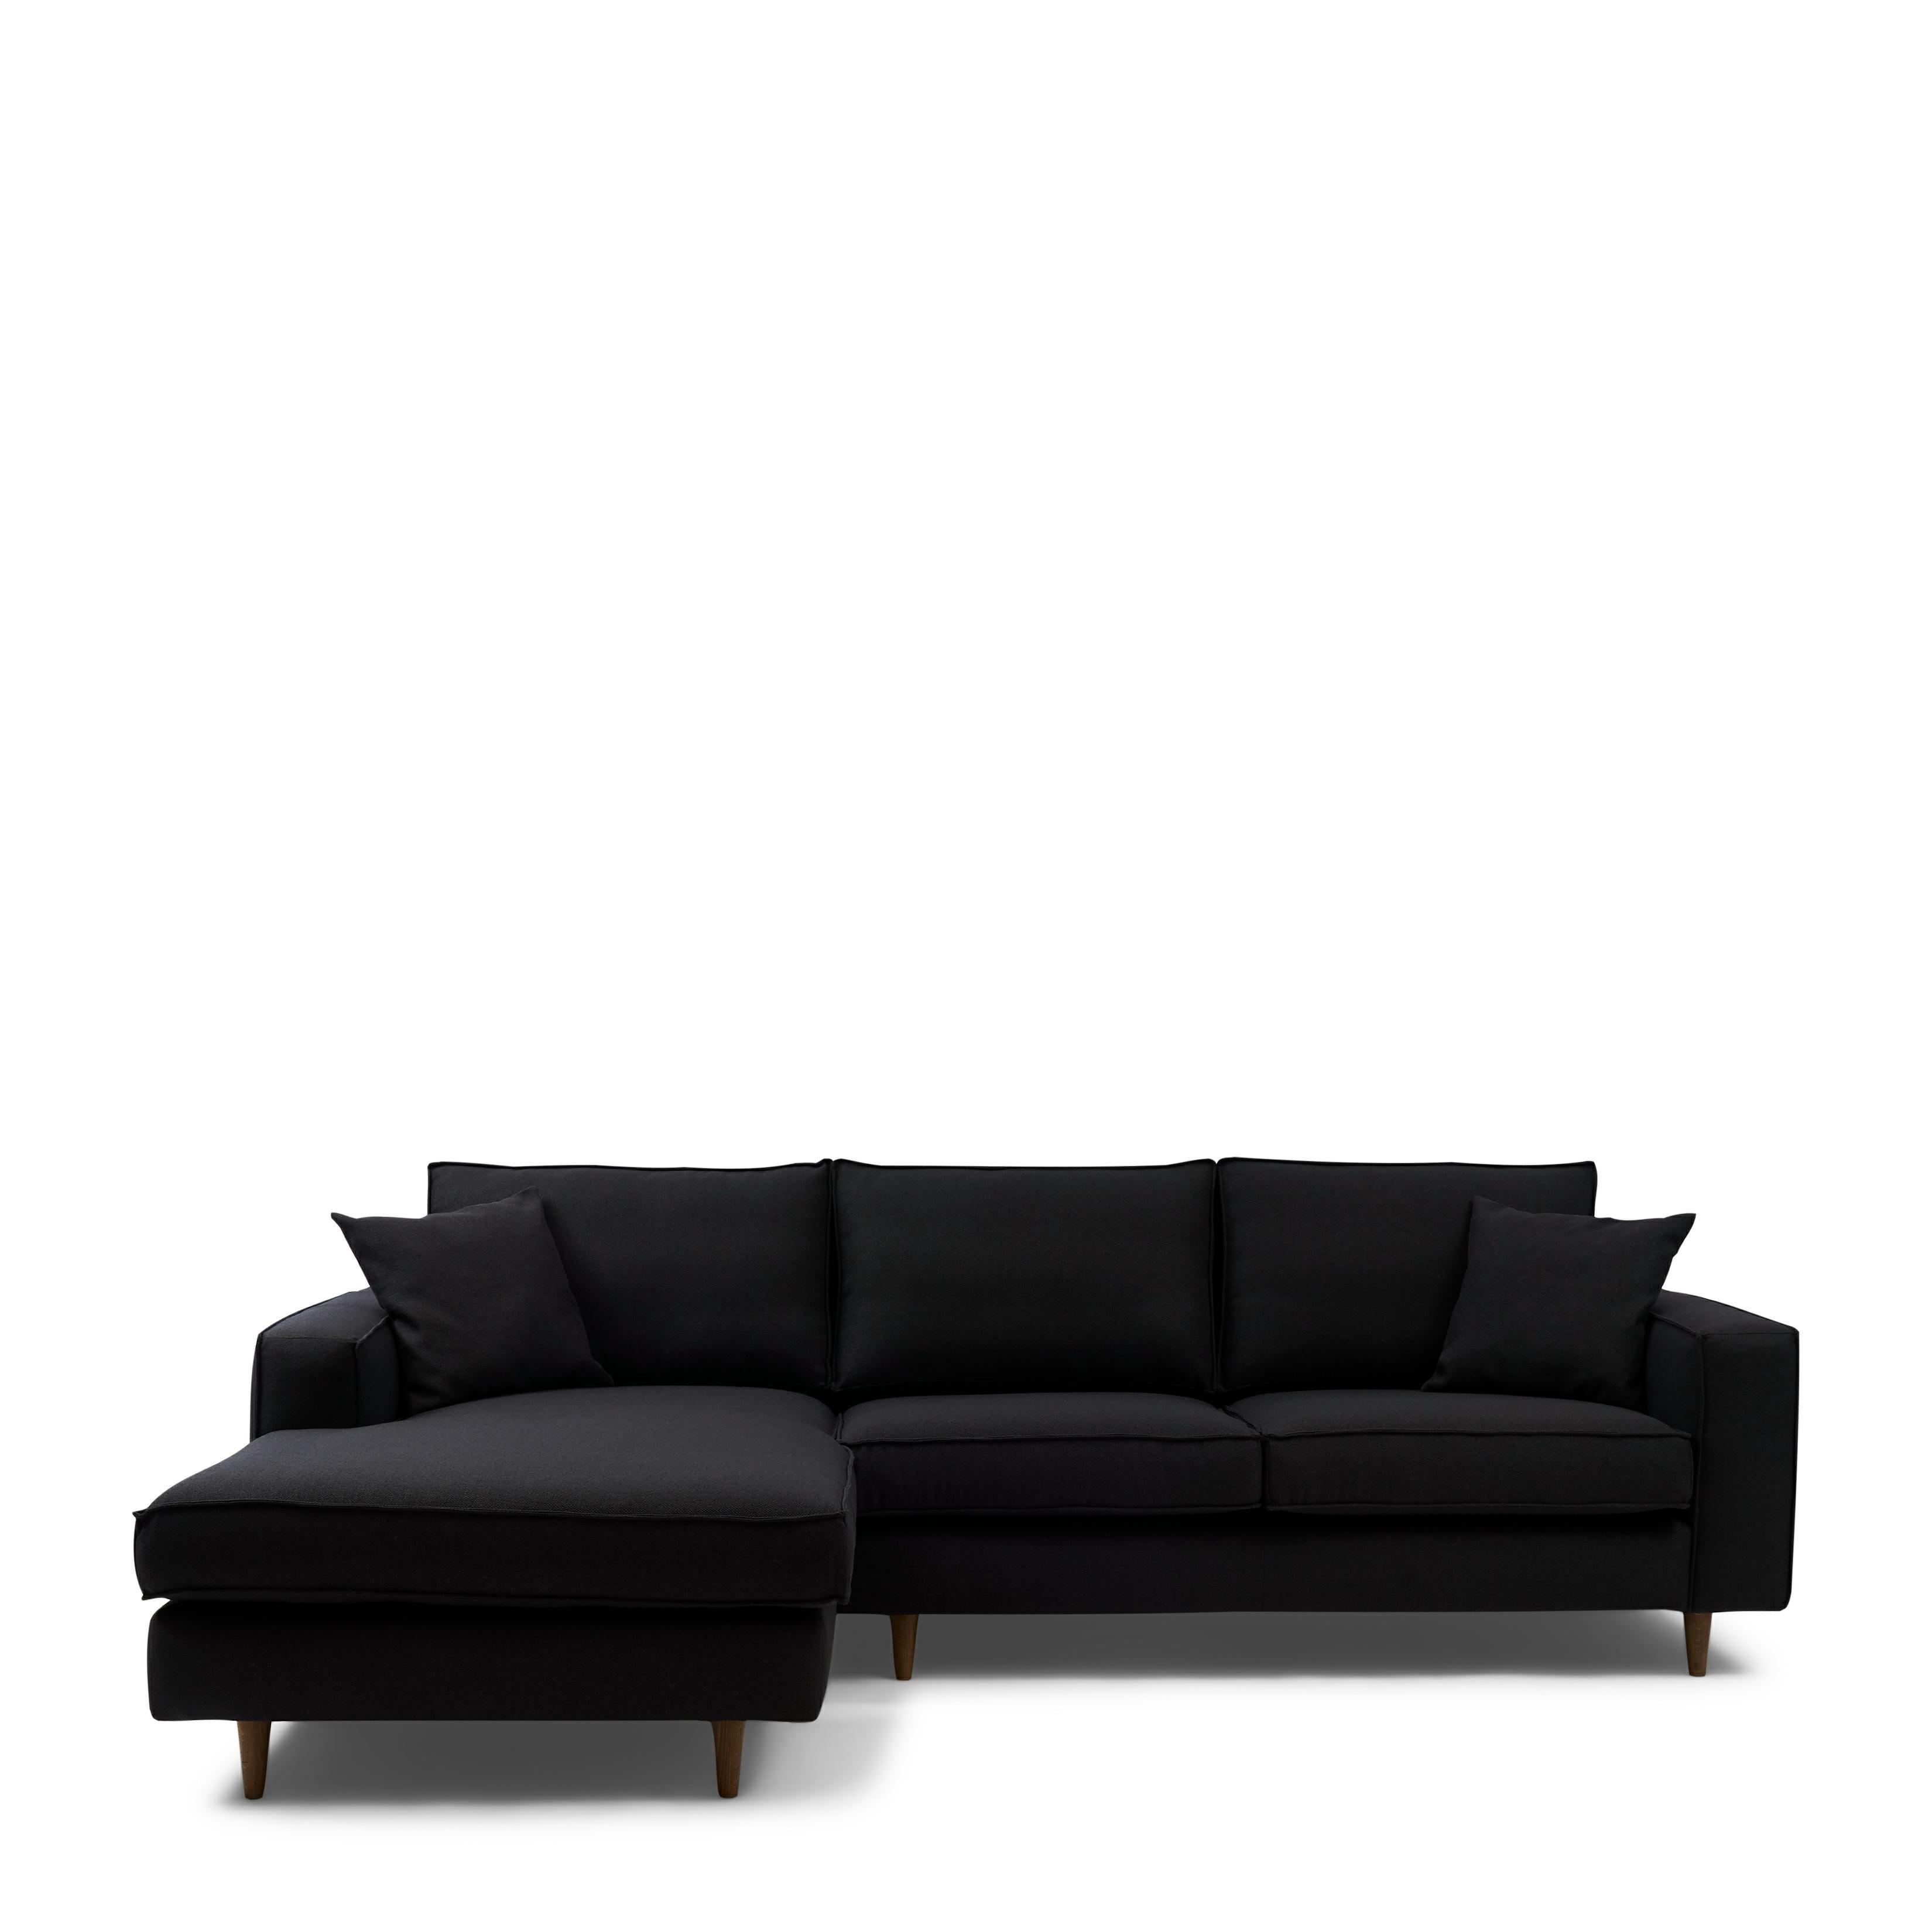 Kendall Sofa With Chaise Longue Left oxford weave basic black / Rivièra Maison